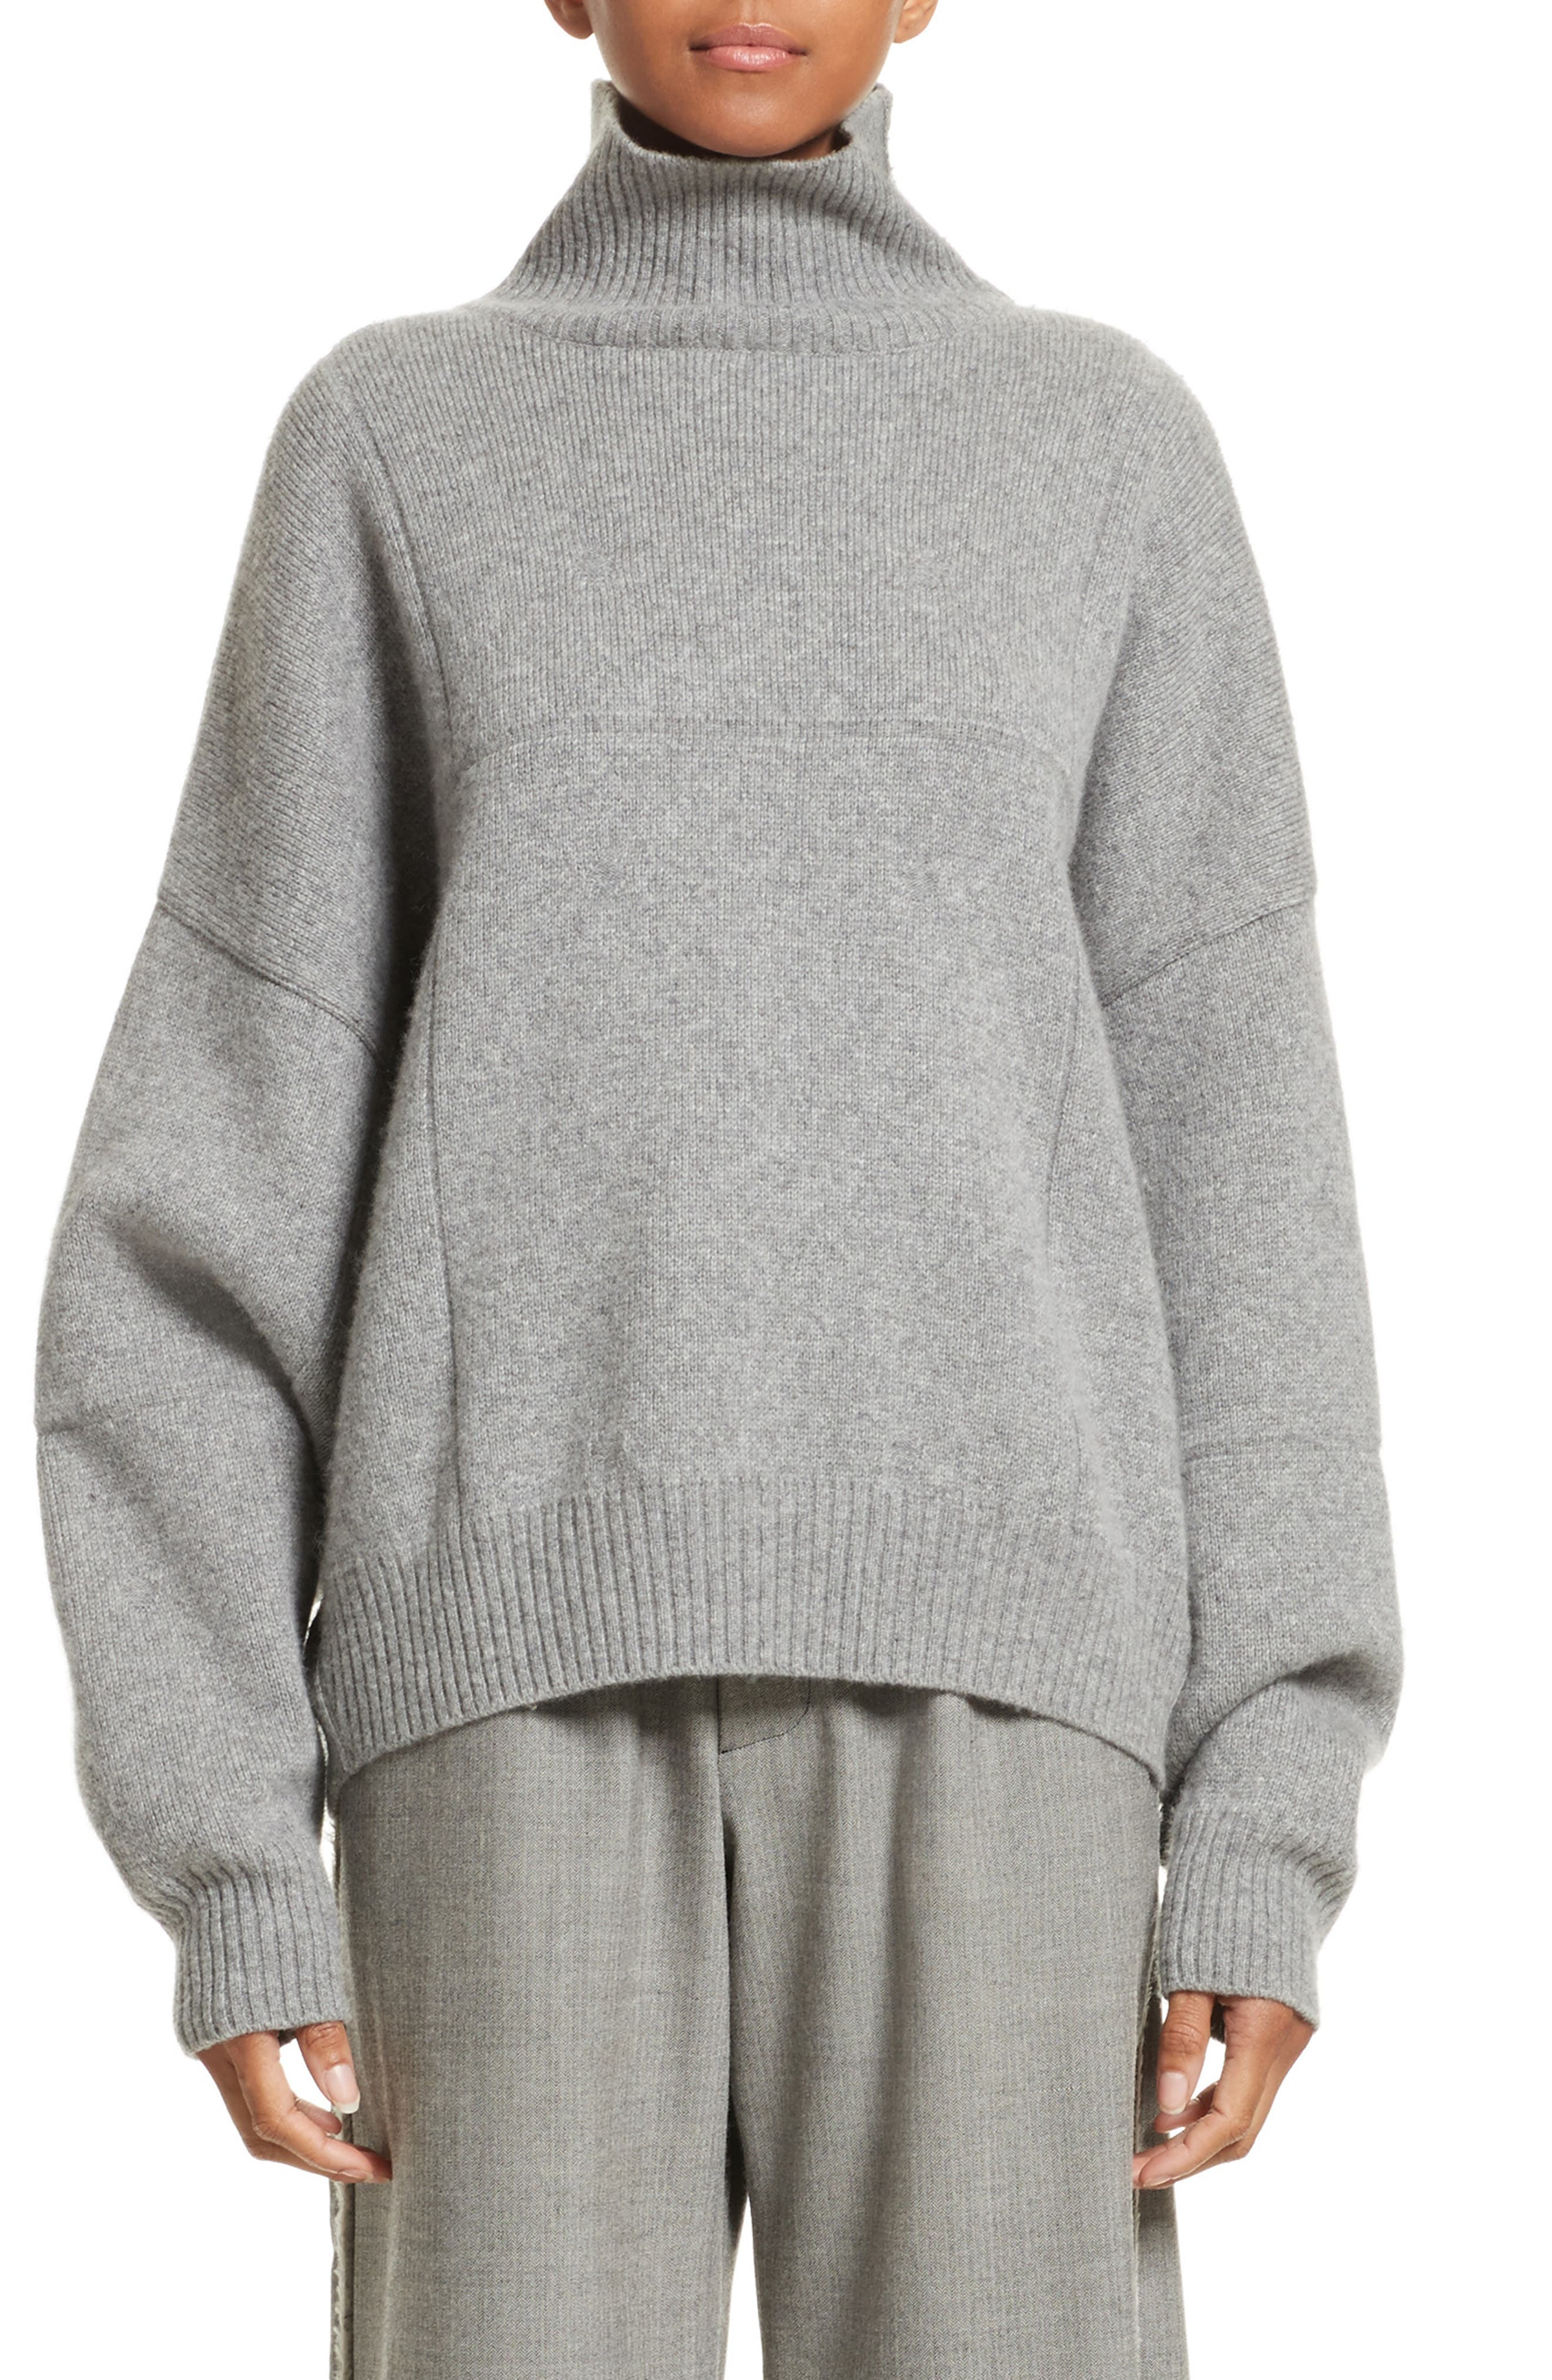 Alternate Image 1 Selected - Vejas Concrete Wool Turtleneck Sweater